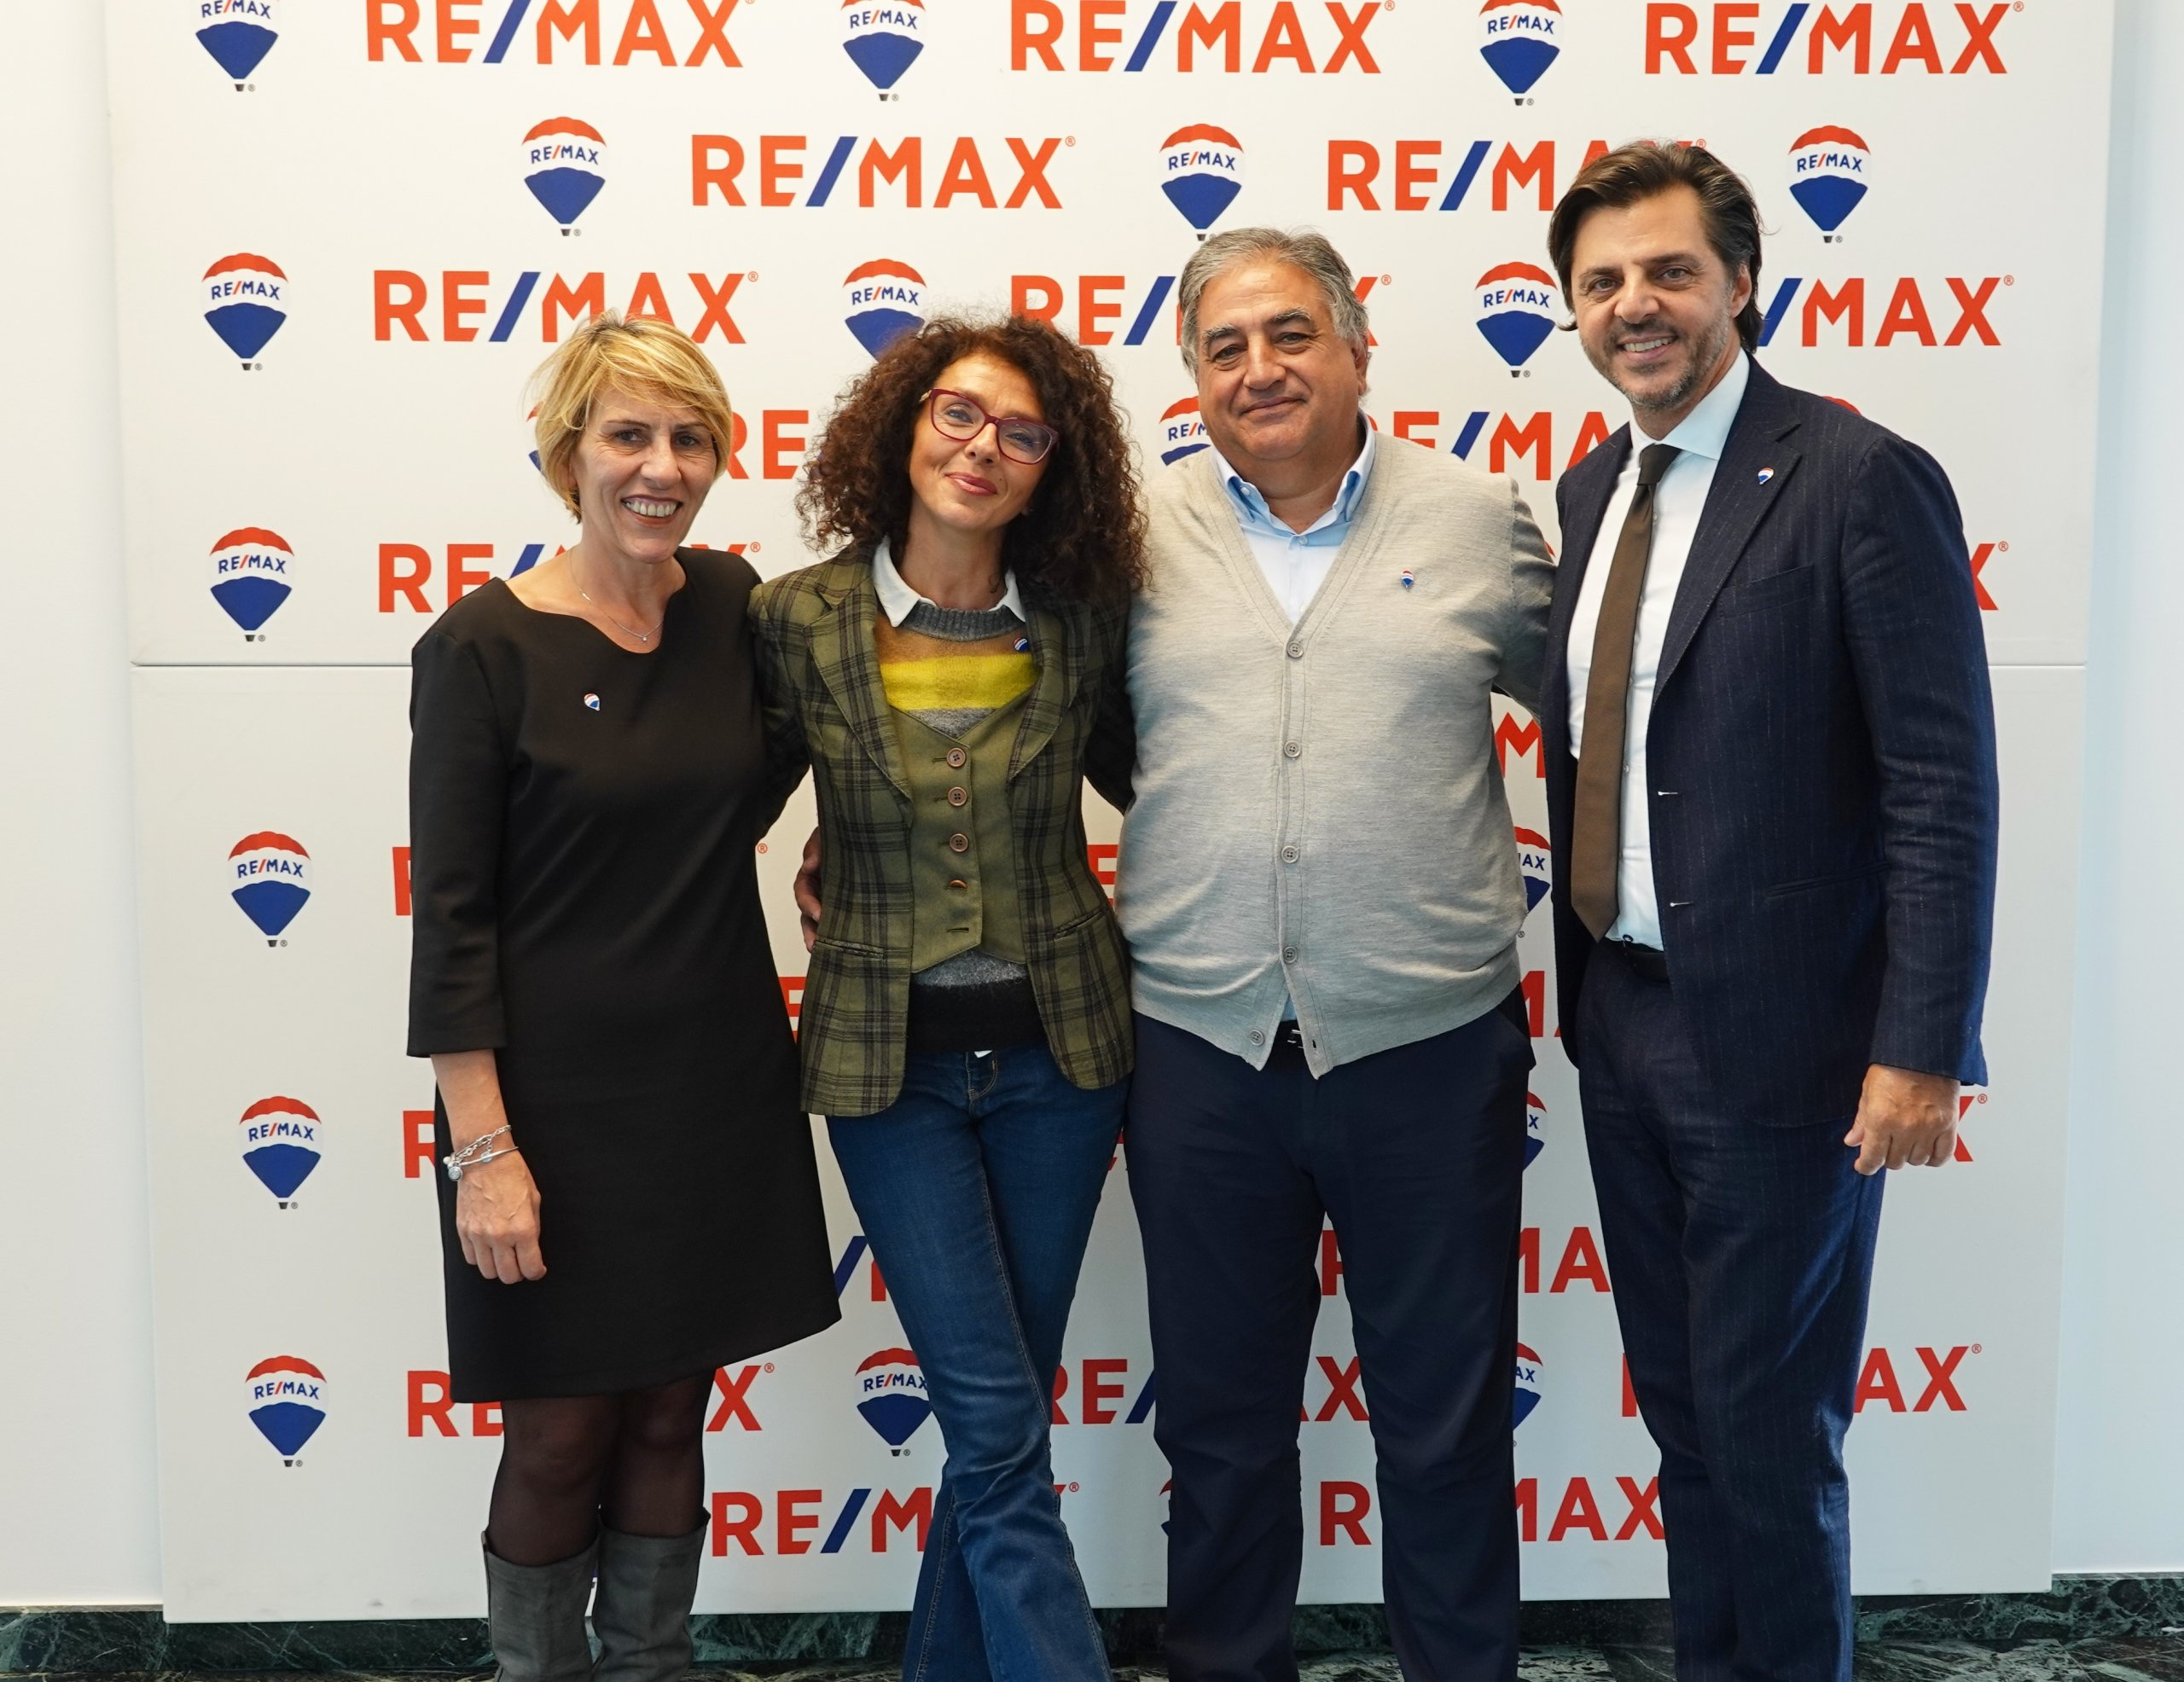 Ugo Farina e Sabrina Borelli Roma REMAX Gruppo Casa RE